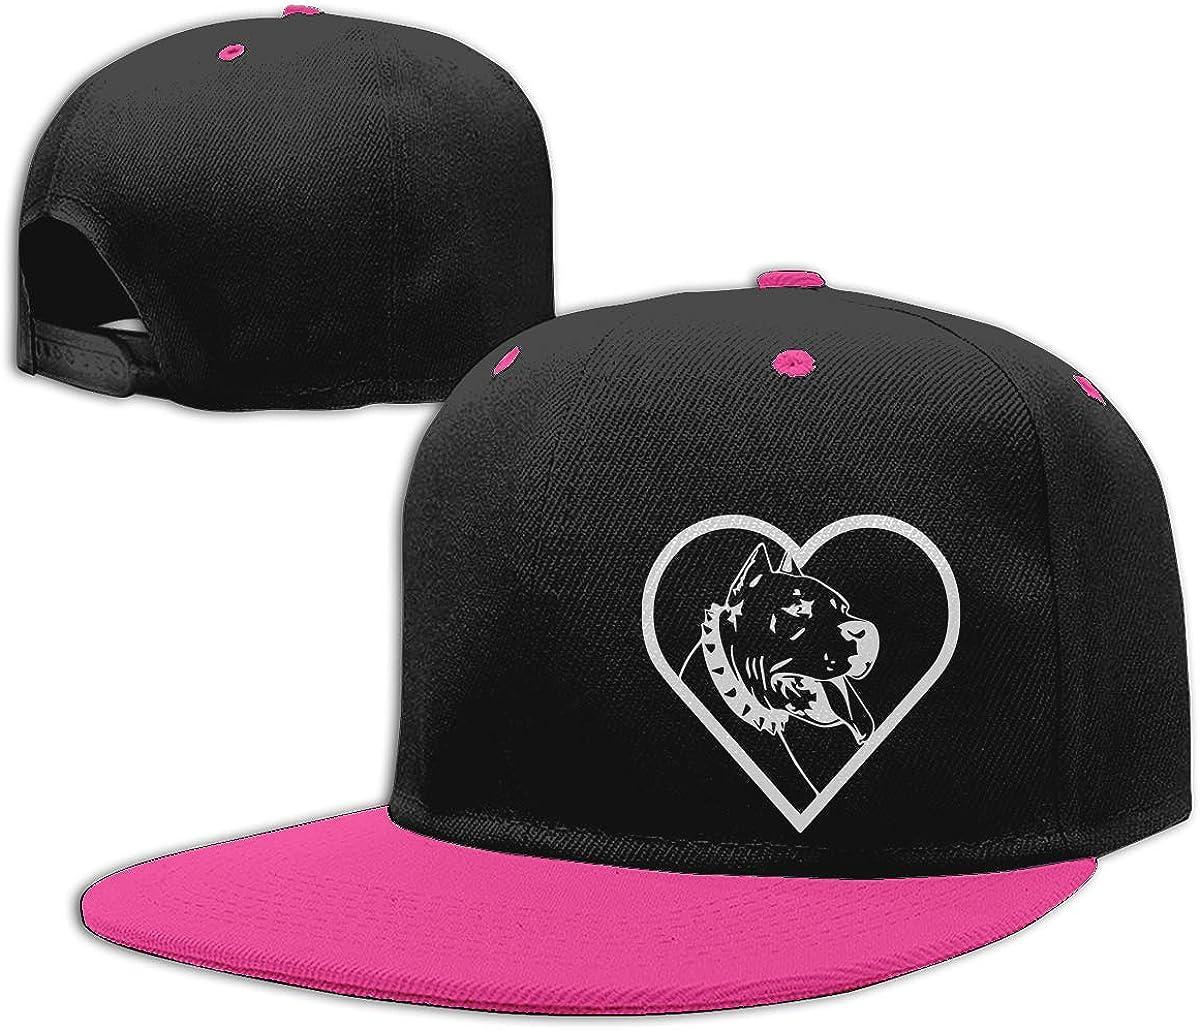 NMG-01 Women Men Trucker Cap American Pit Bull Heart-1 Printed Hip Hop Baseball Caps